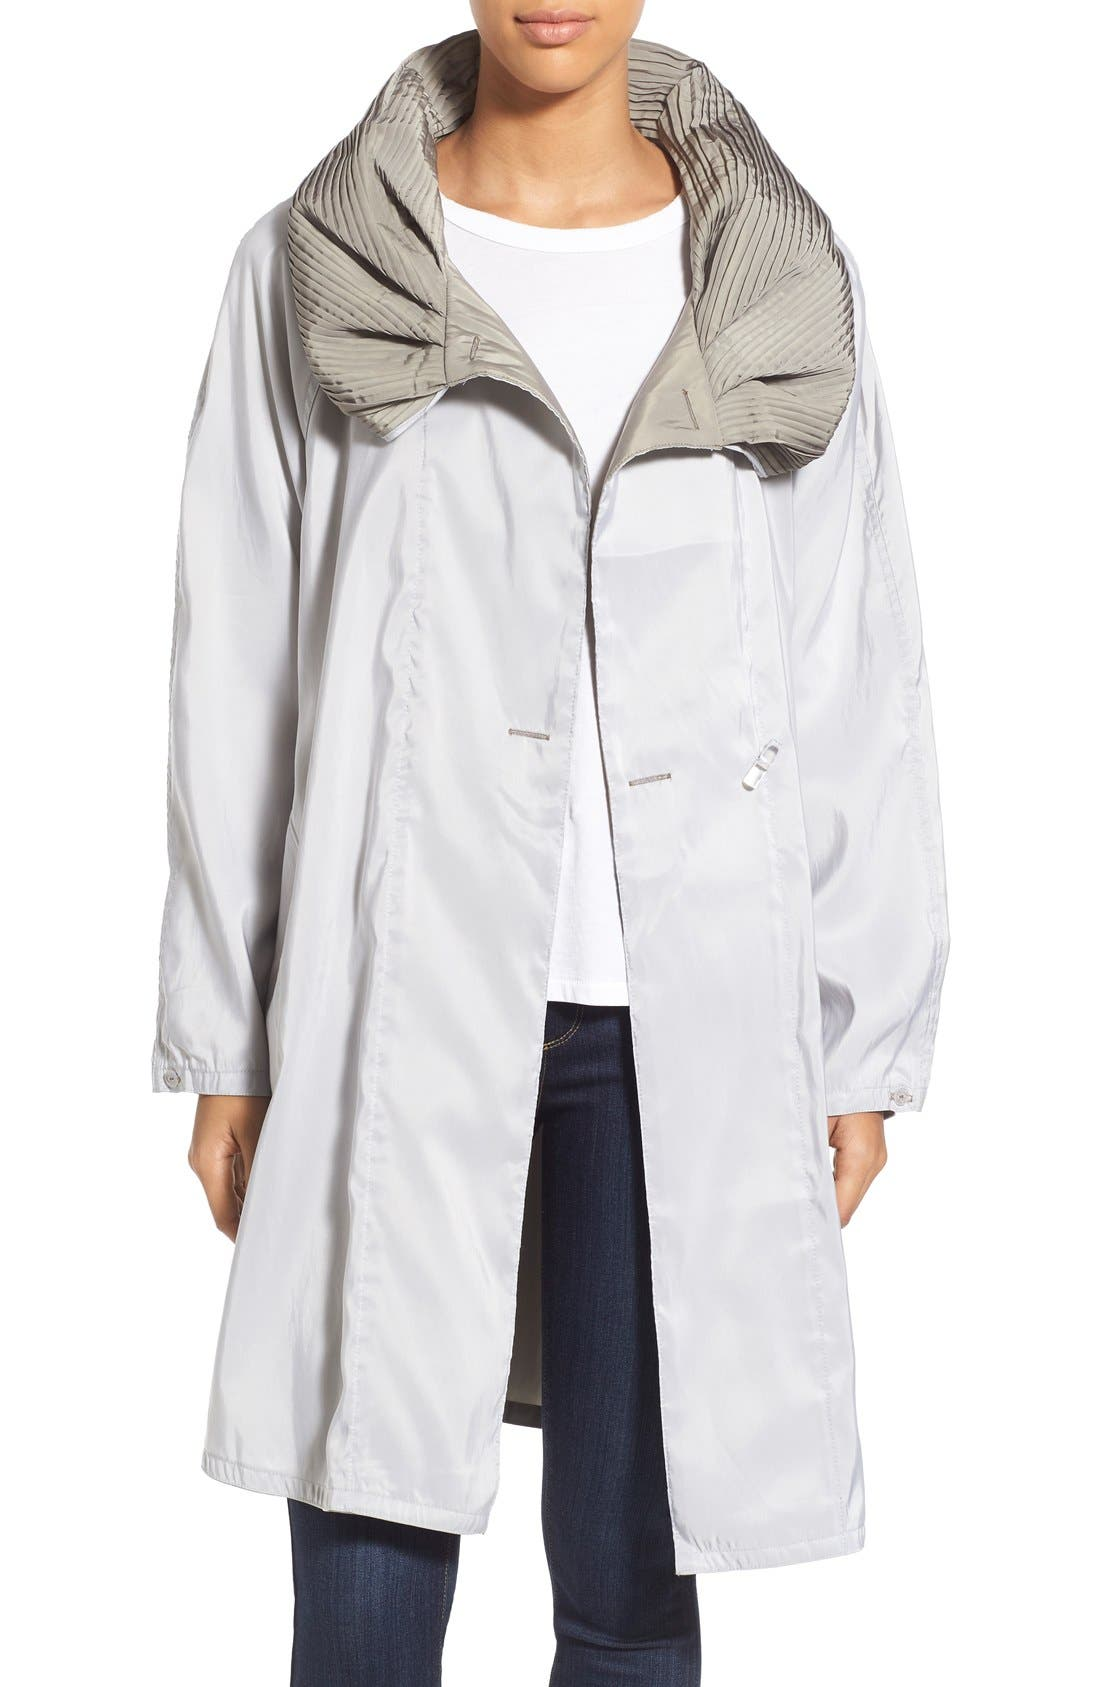 Mycra Pac Designer Wear Reversible Pleat Hood Packable Travel Coat